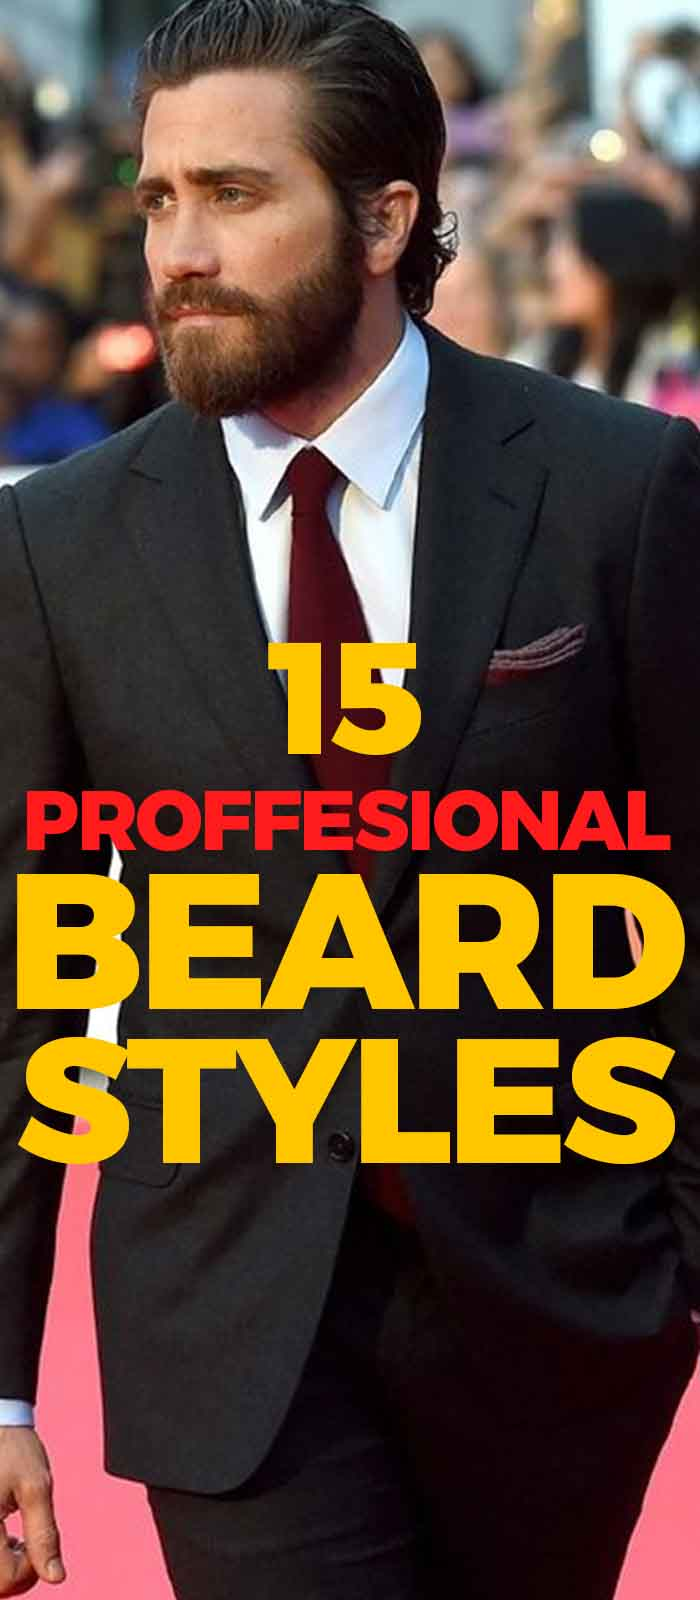 Black Suit Professional Beard for men!